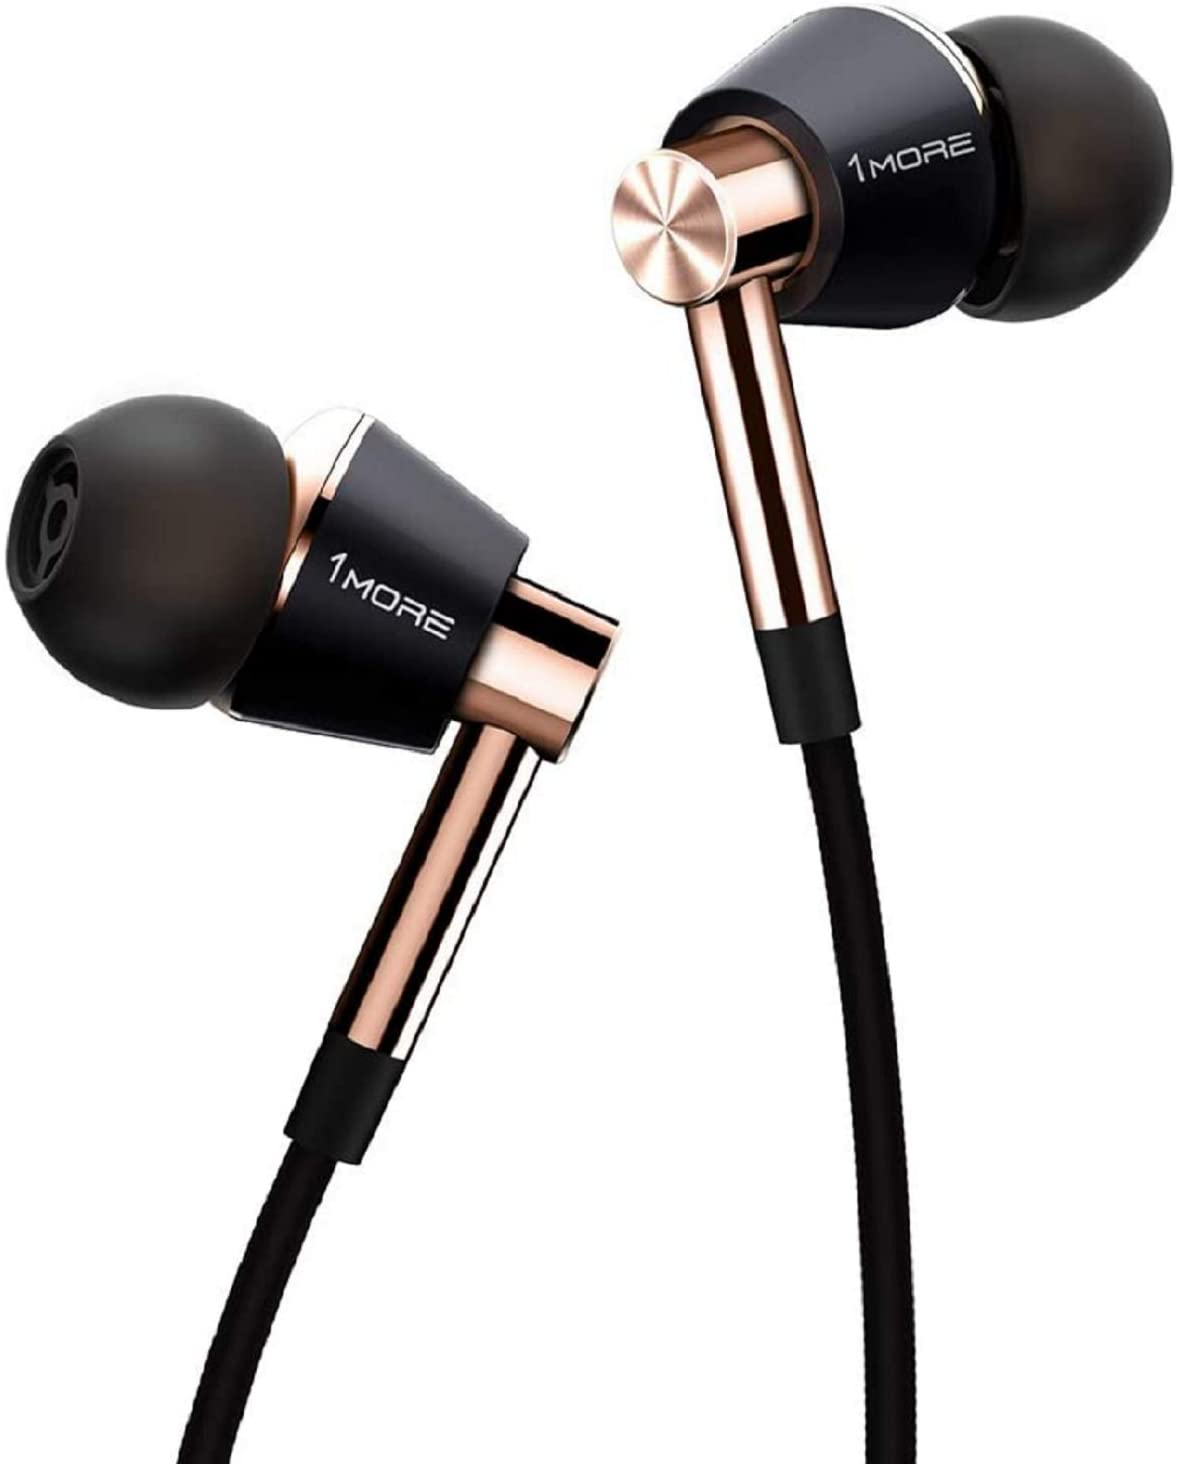 1MORE Triple Driver In-Ear Earphones - Best In-Ear Budget Audiophile Headphones